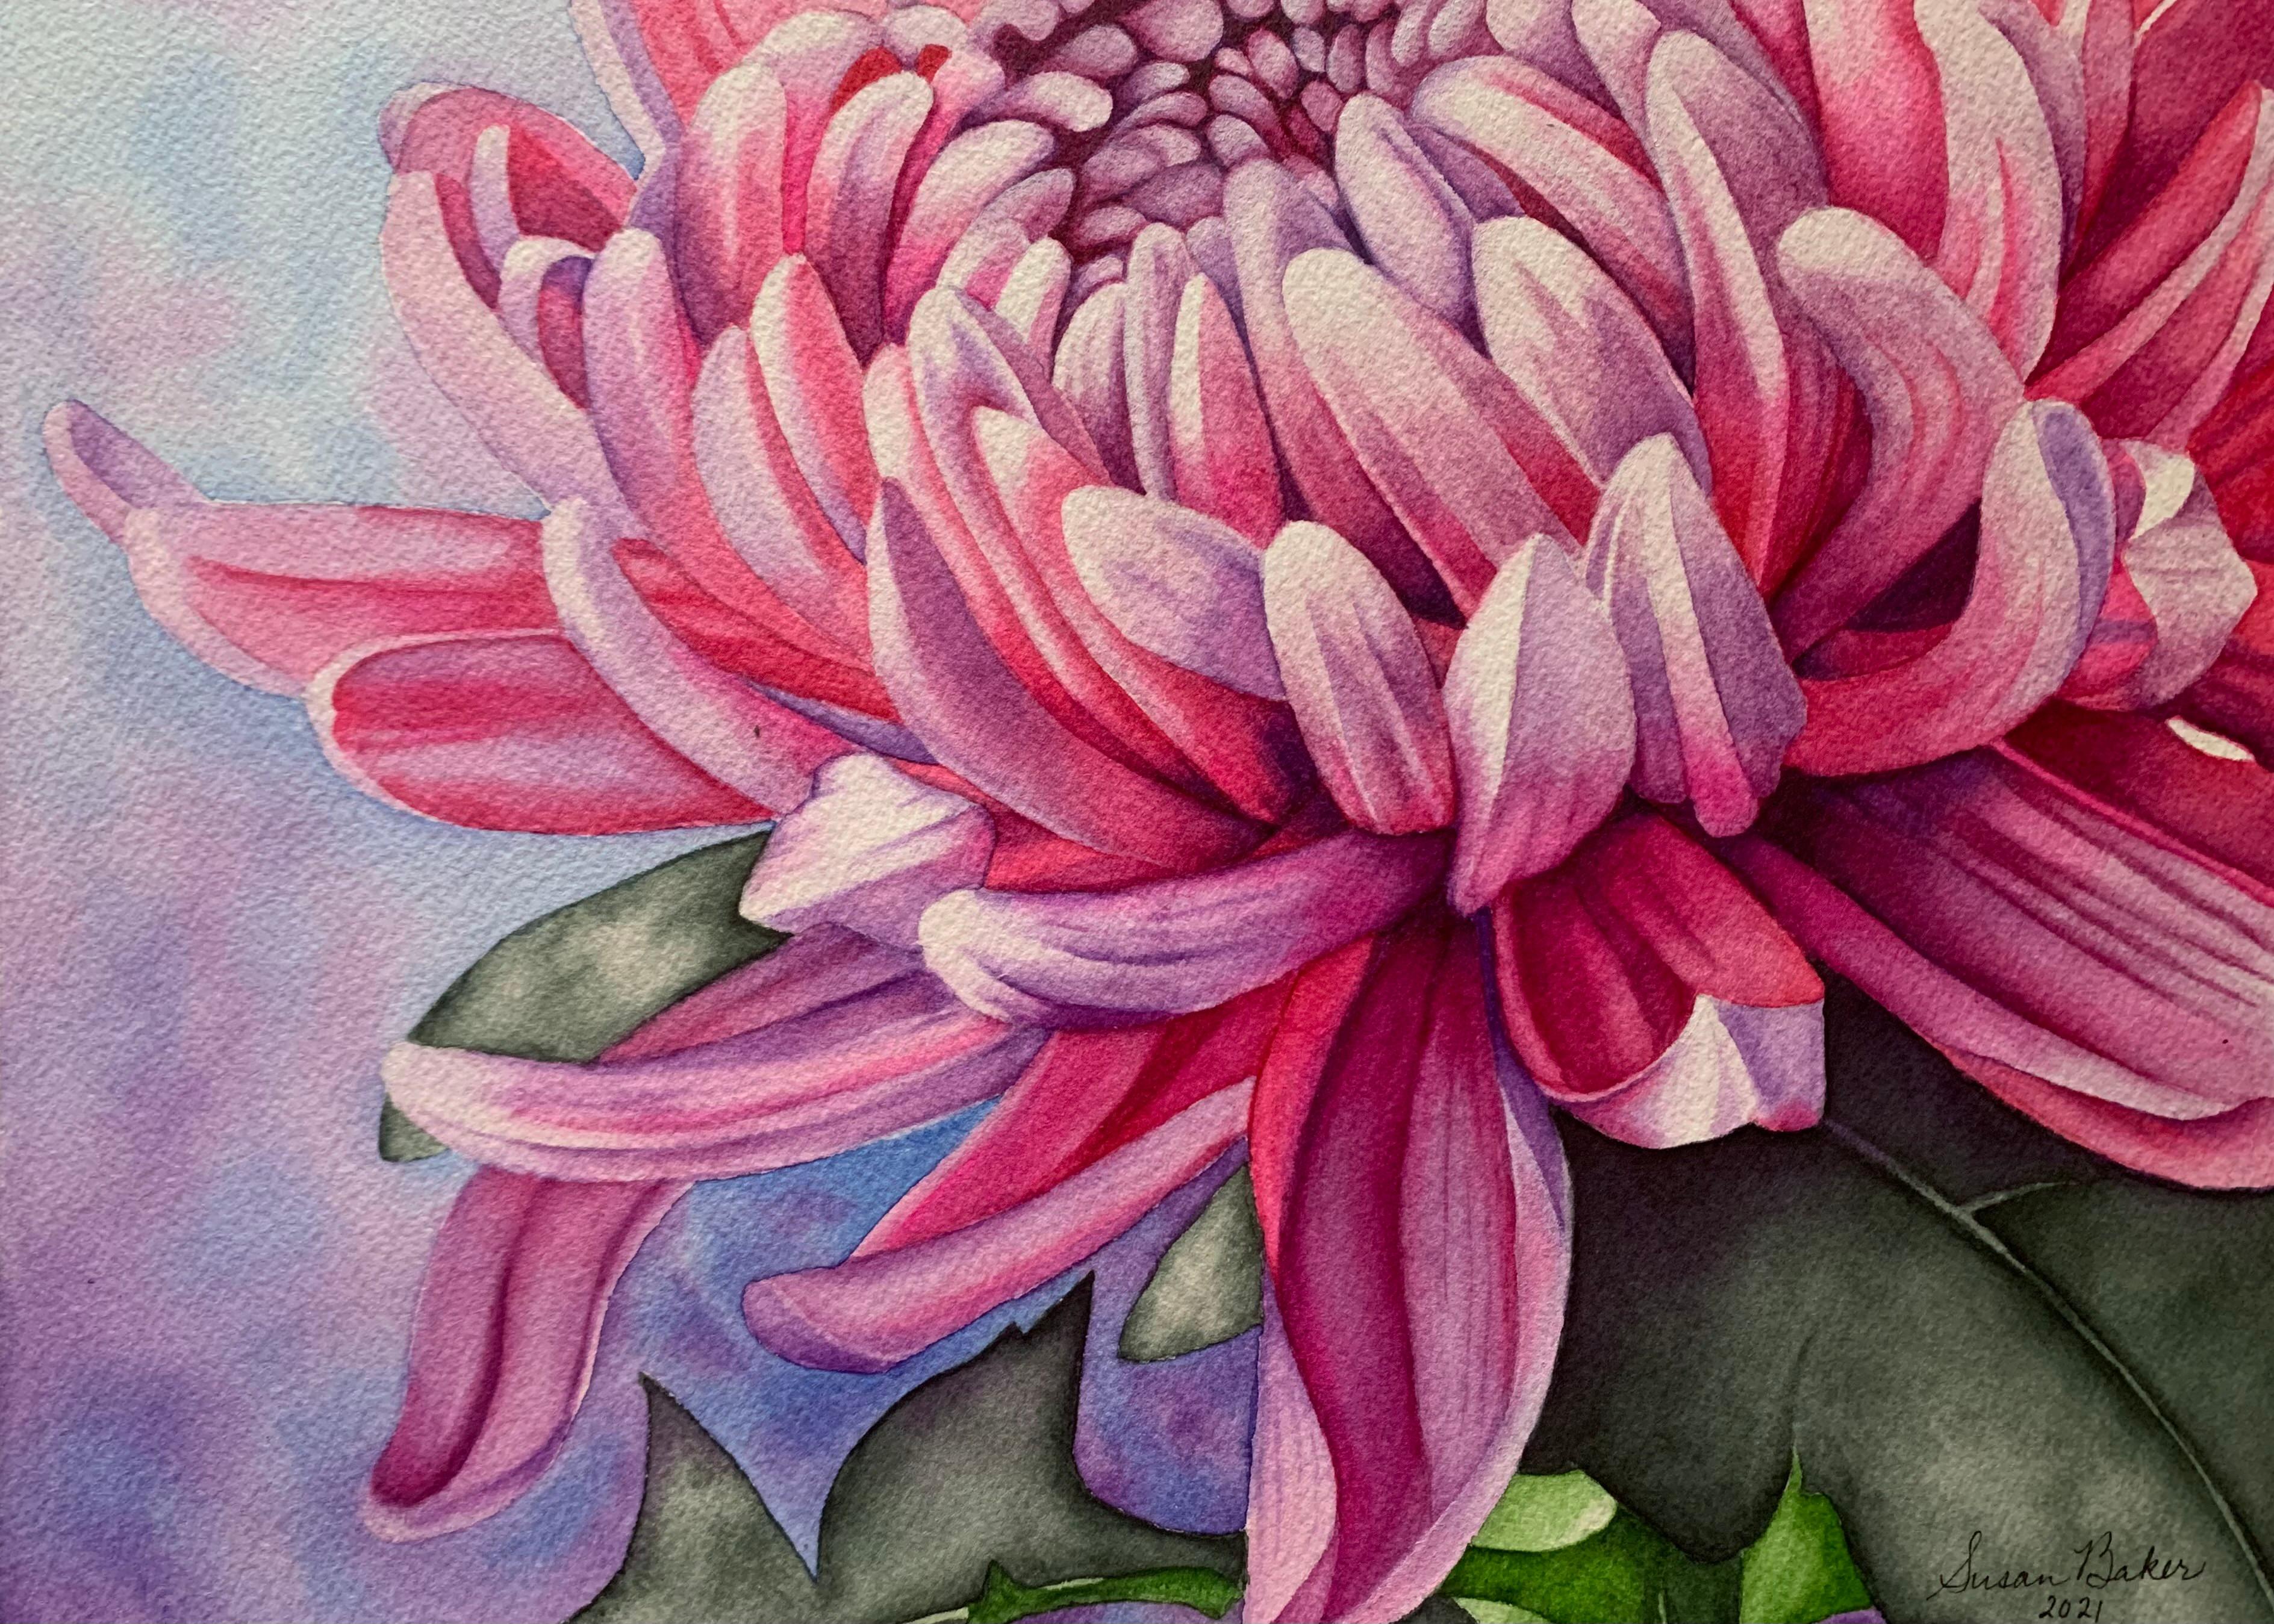 Intermediate to Advanced Watercolors